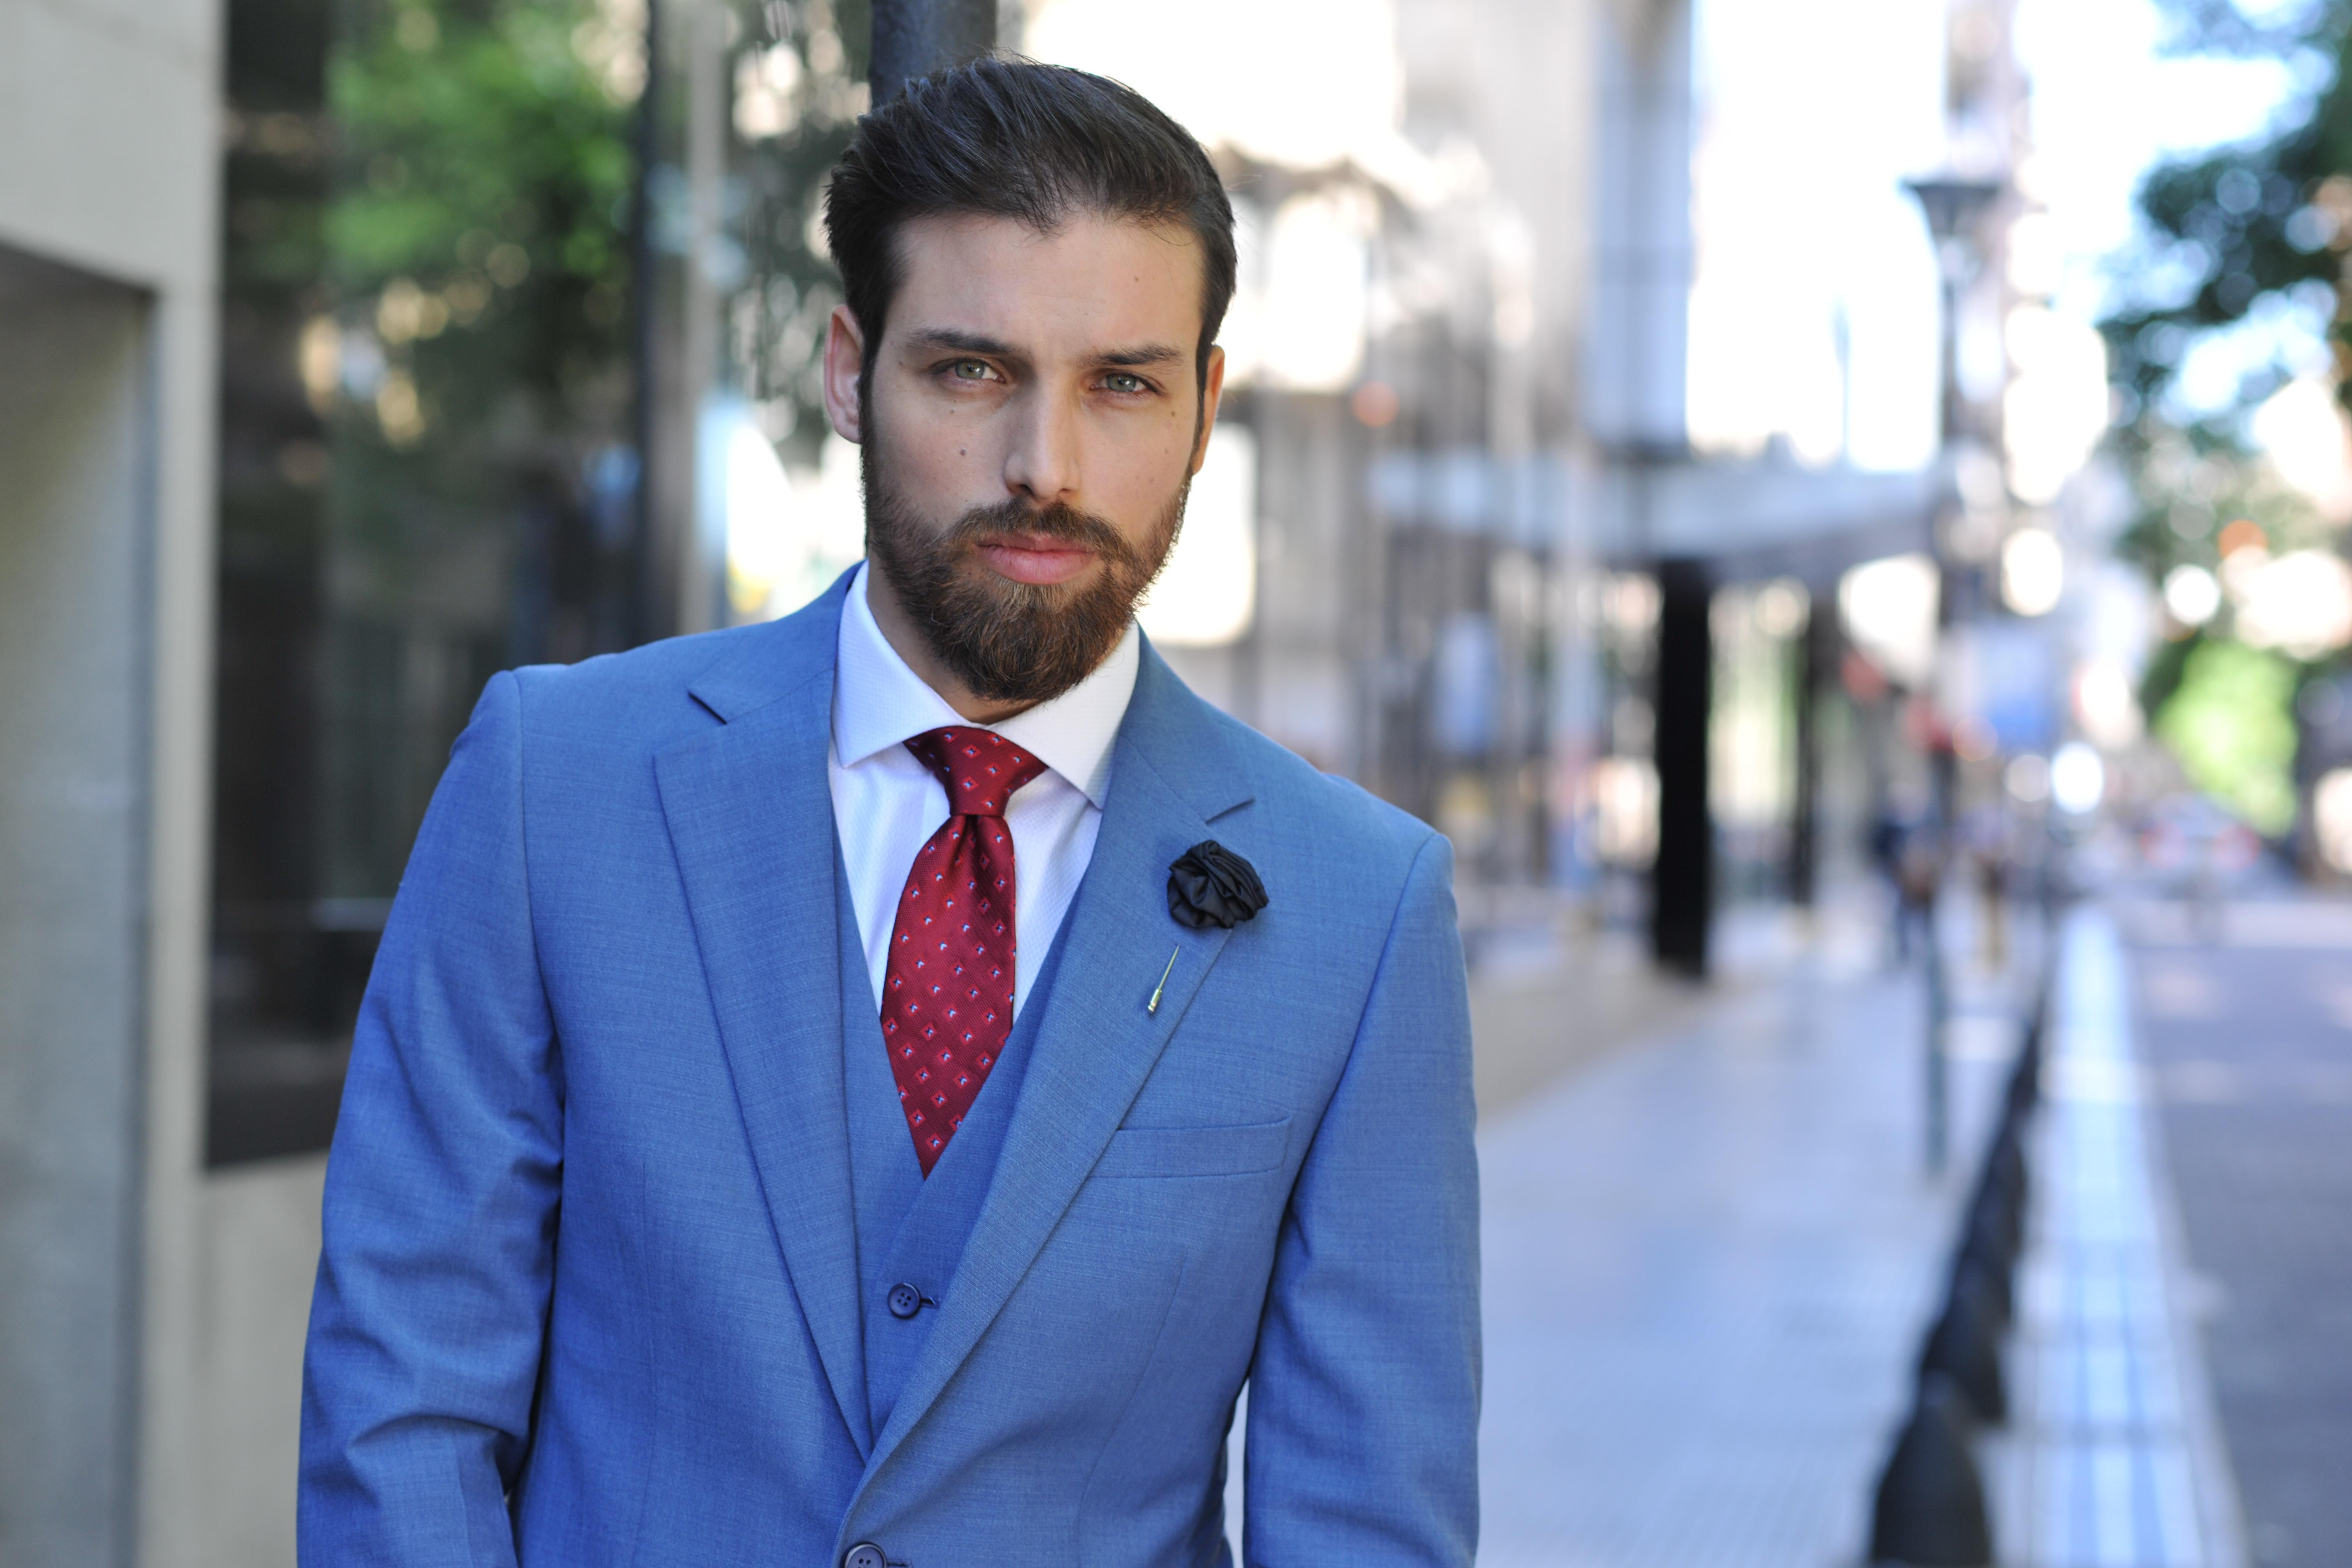 Trajes formales para hombre bogota arturo calle